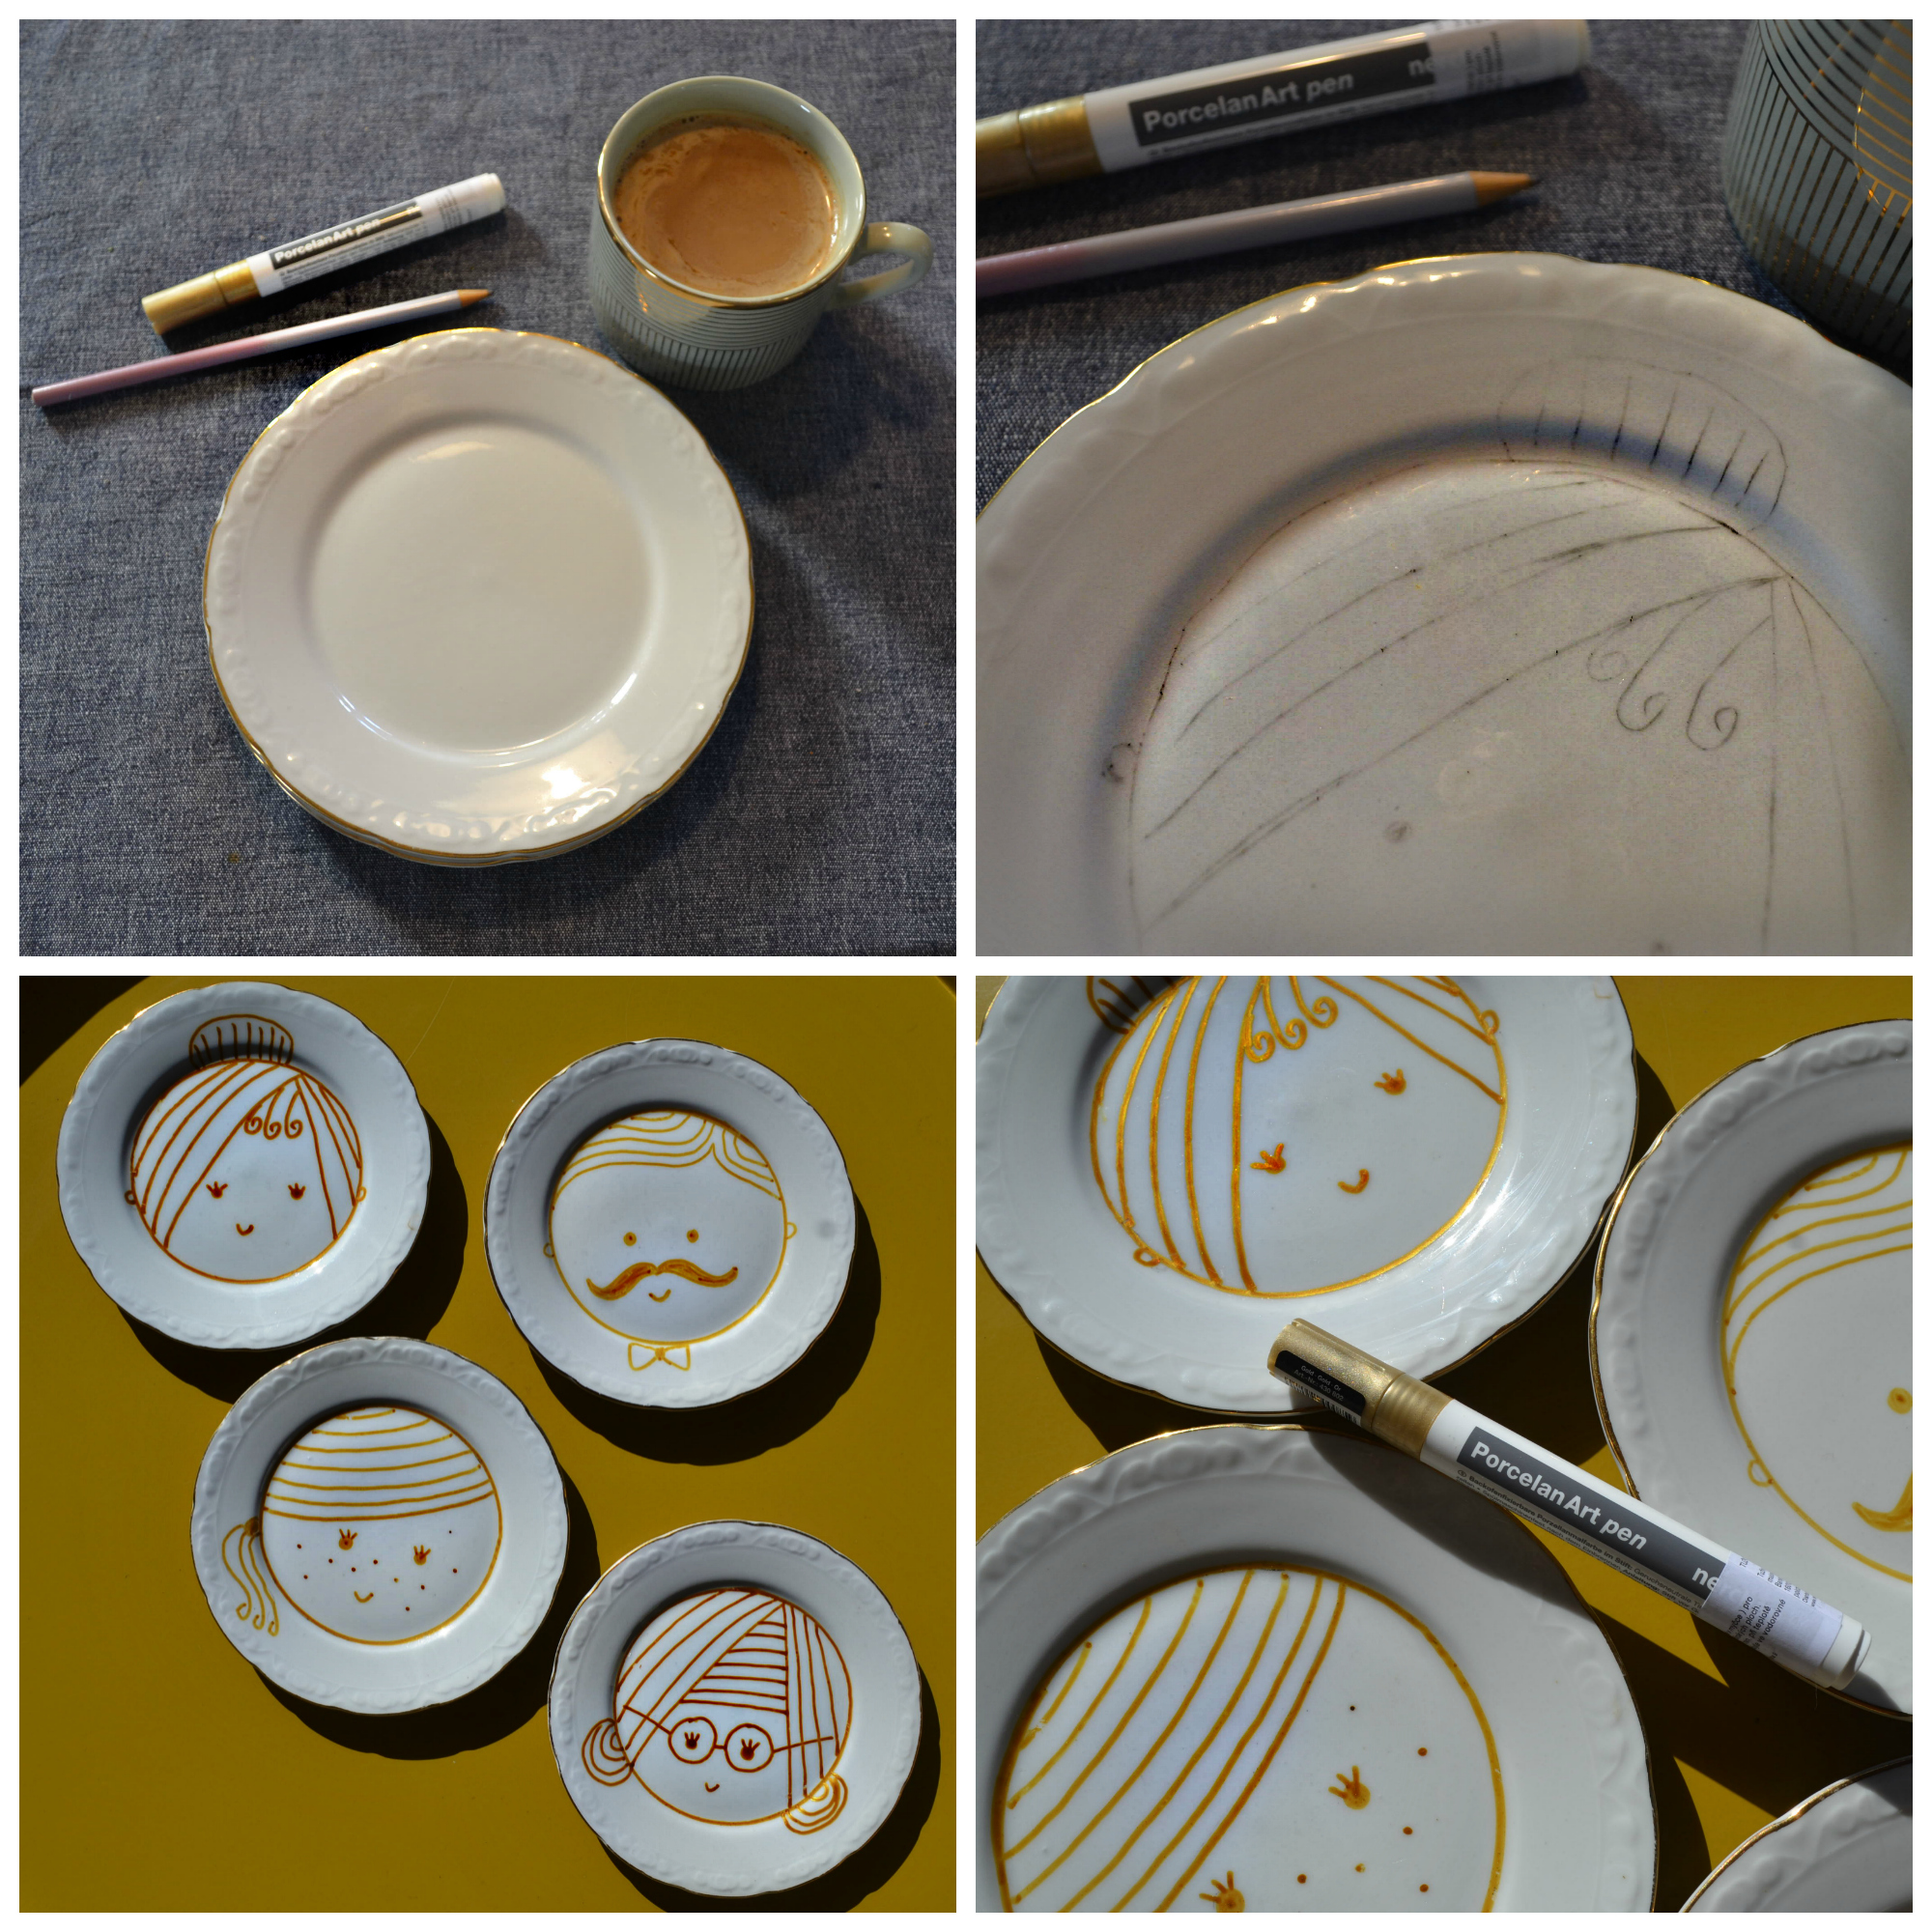 Dekorovani Porcelanu Pro Zacatecniky Vytvorimsi